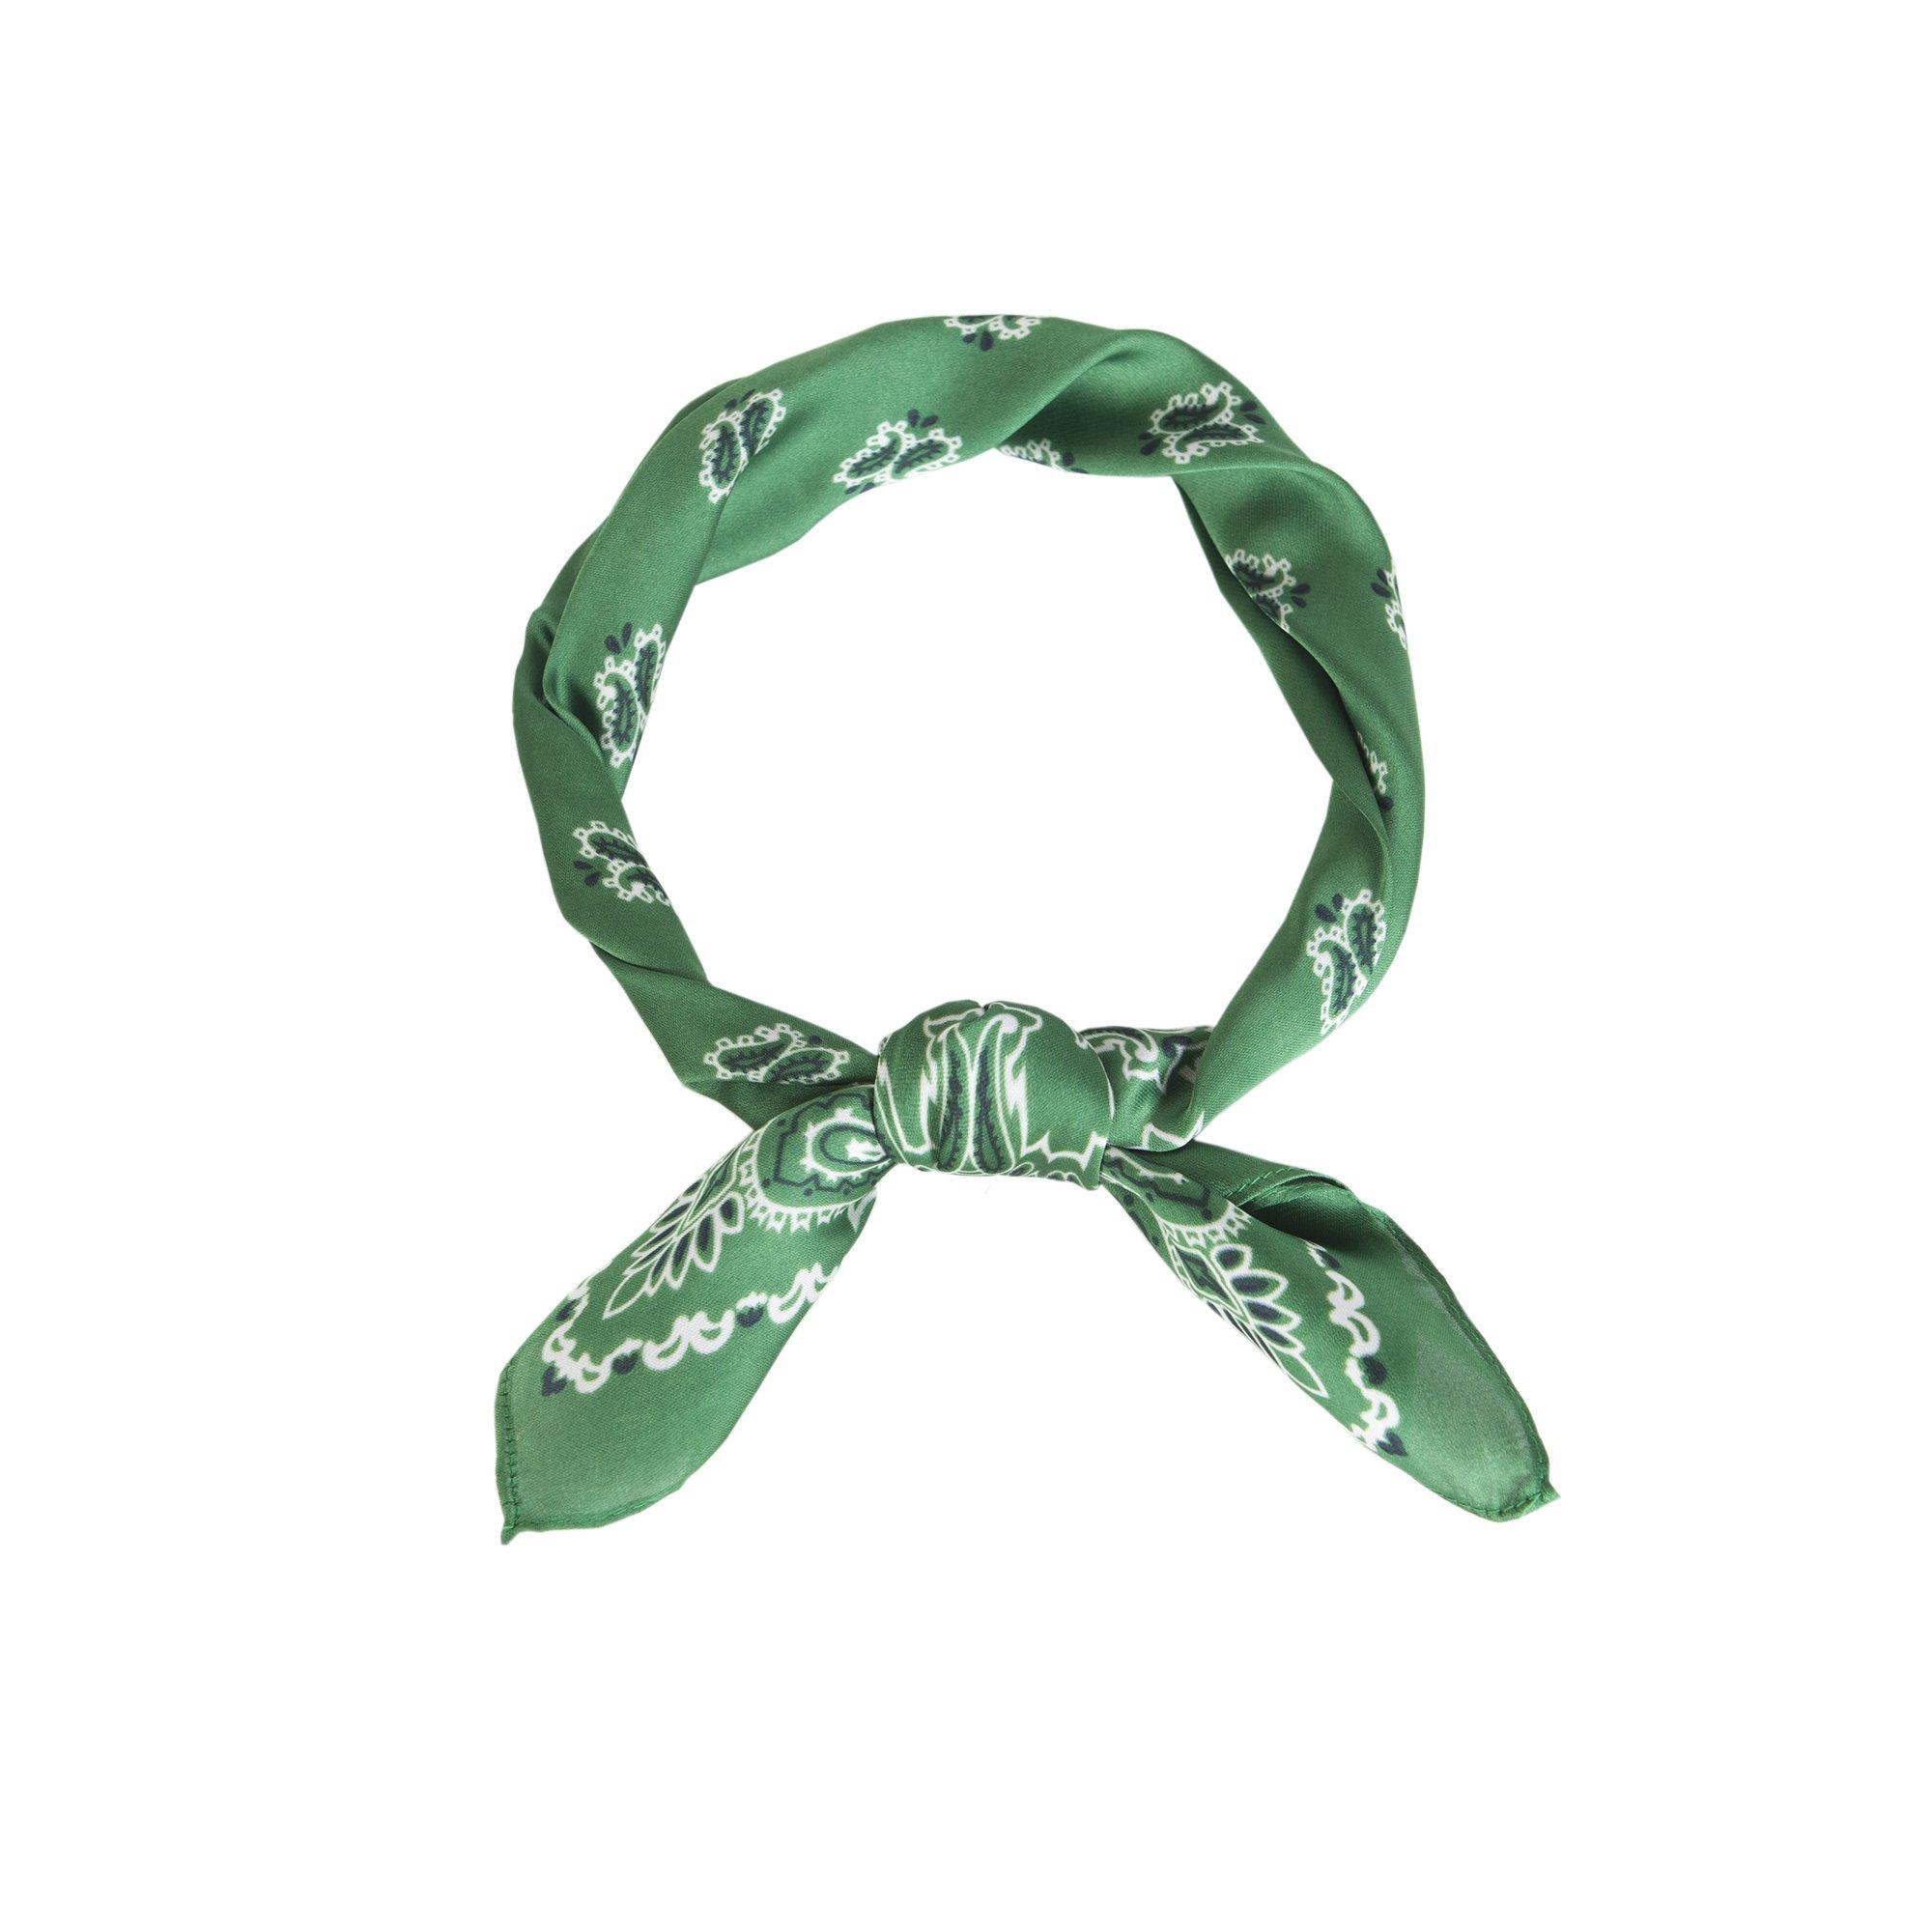 Lusm Women's Soft Lightweight Polyester Square Beach Bandana Summer Neck Scarf Black (green paisley)